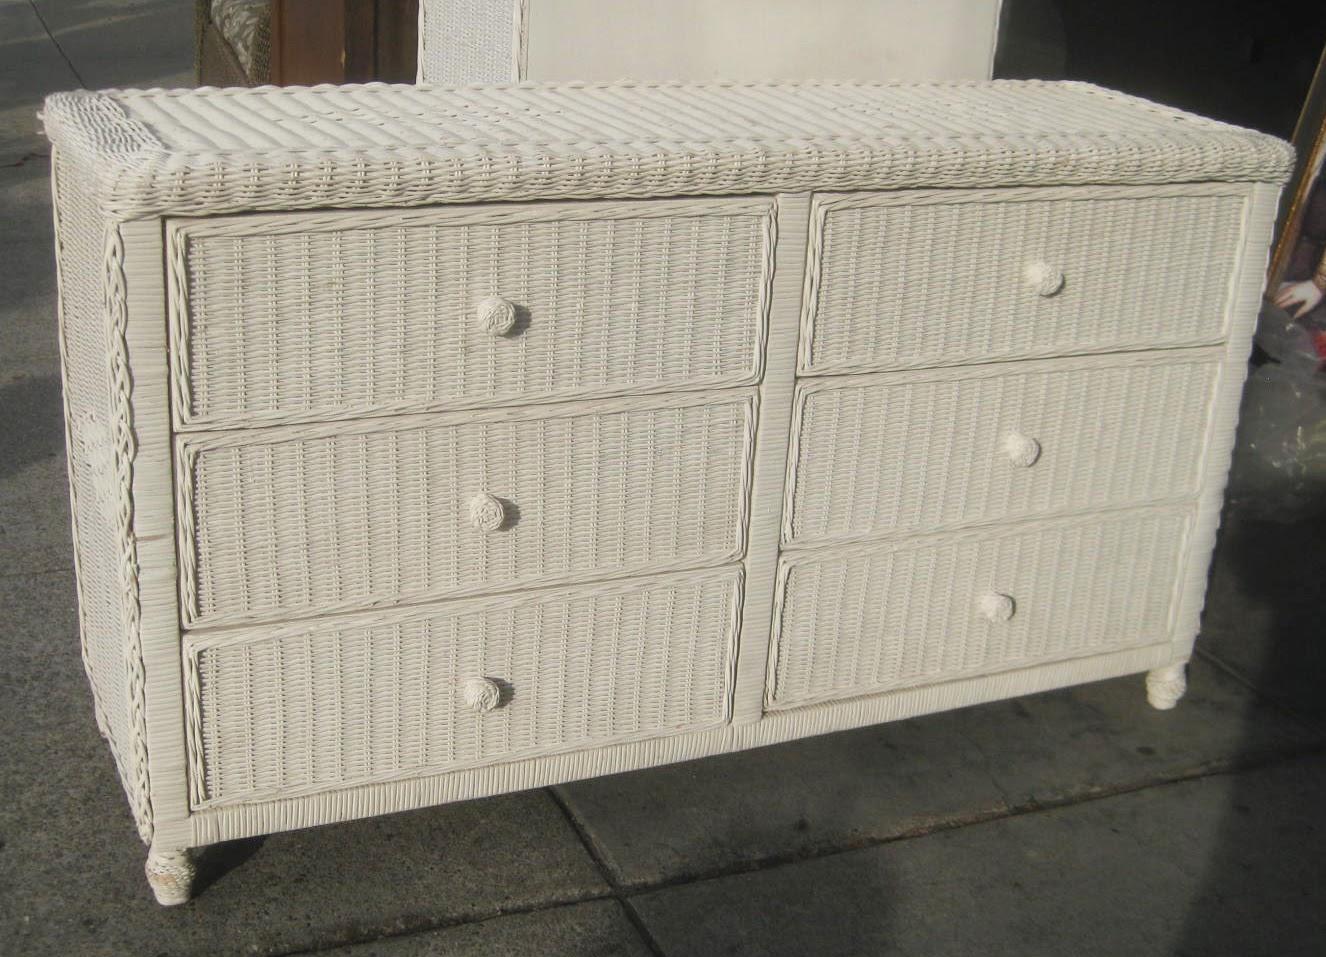 Uhuru furniture collectibles sold wicker dresser 65 for Furniture 65